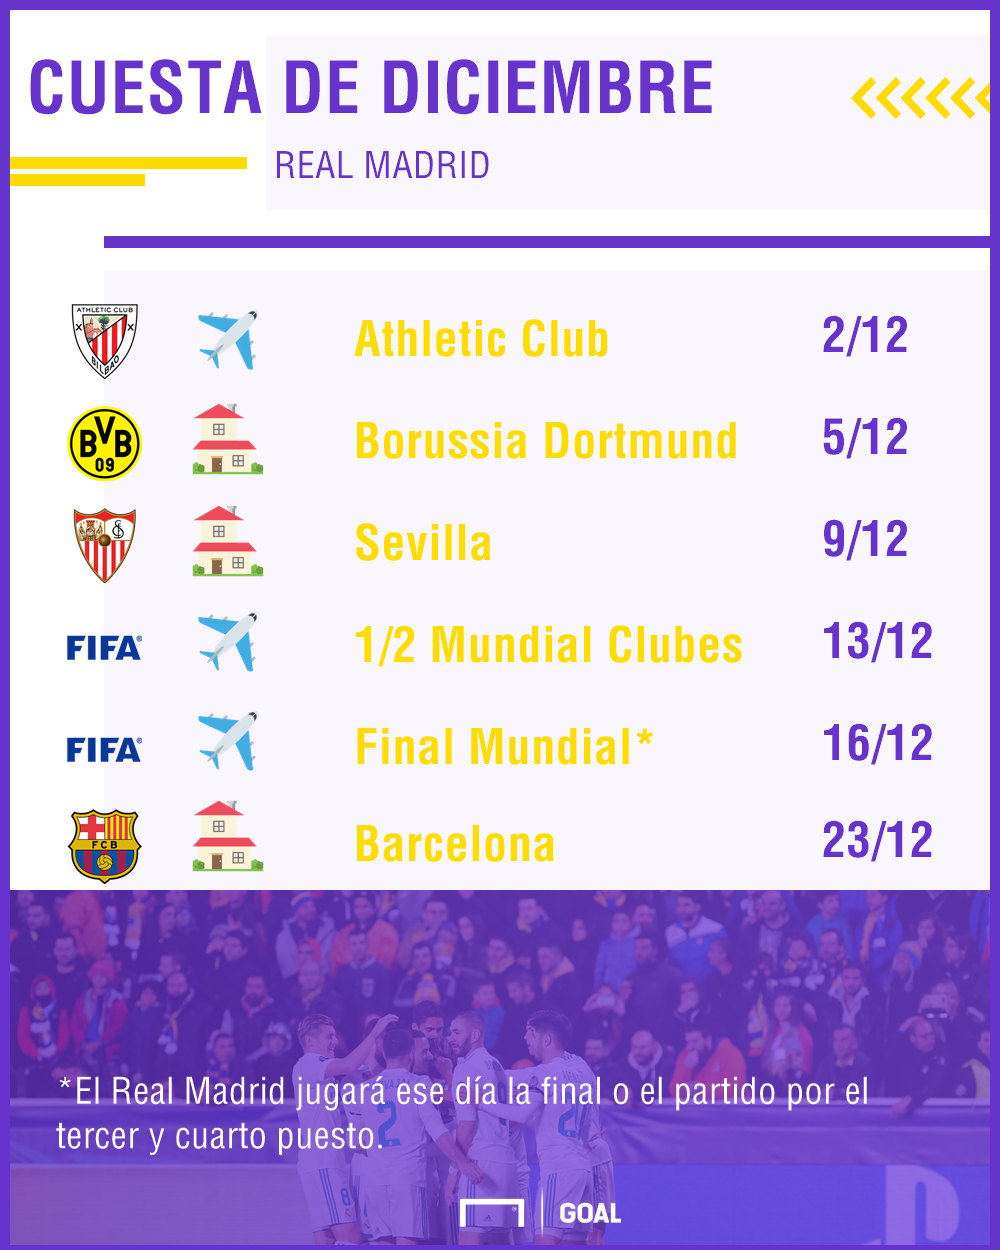 GFX Cuesta diciembre Real Madrid